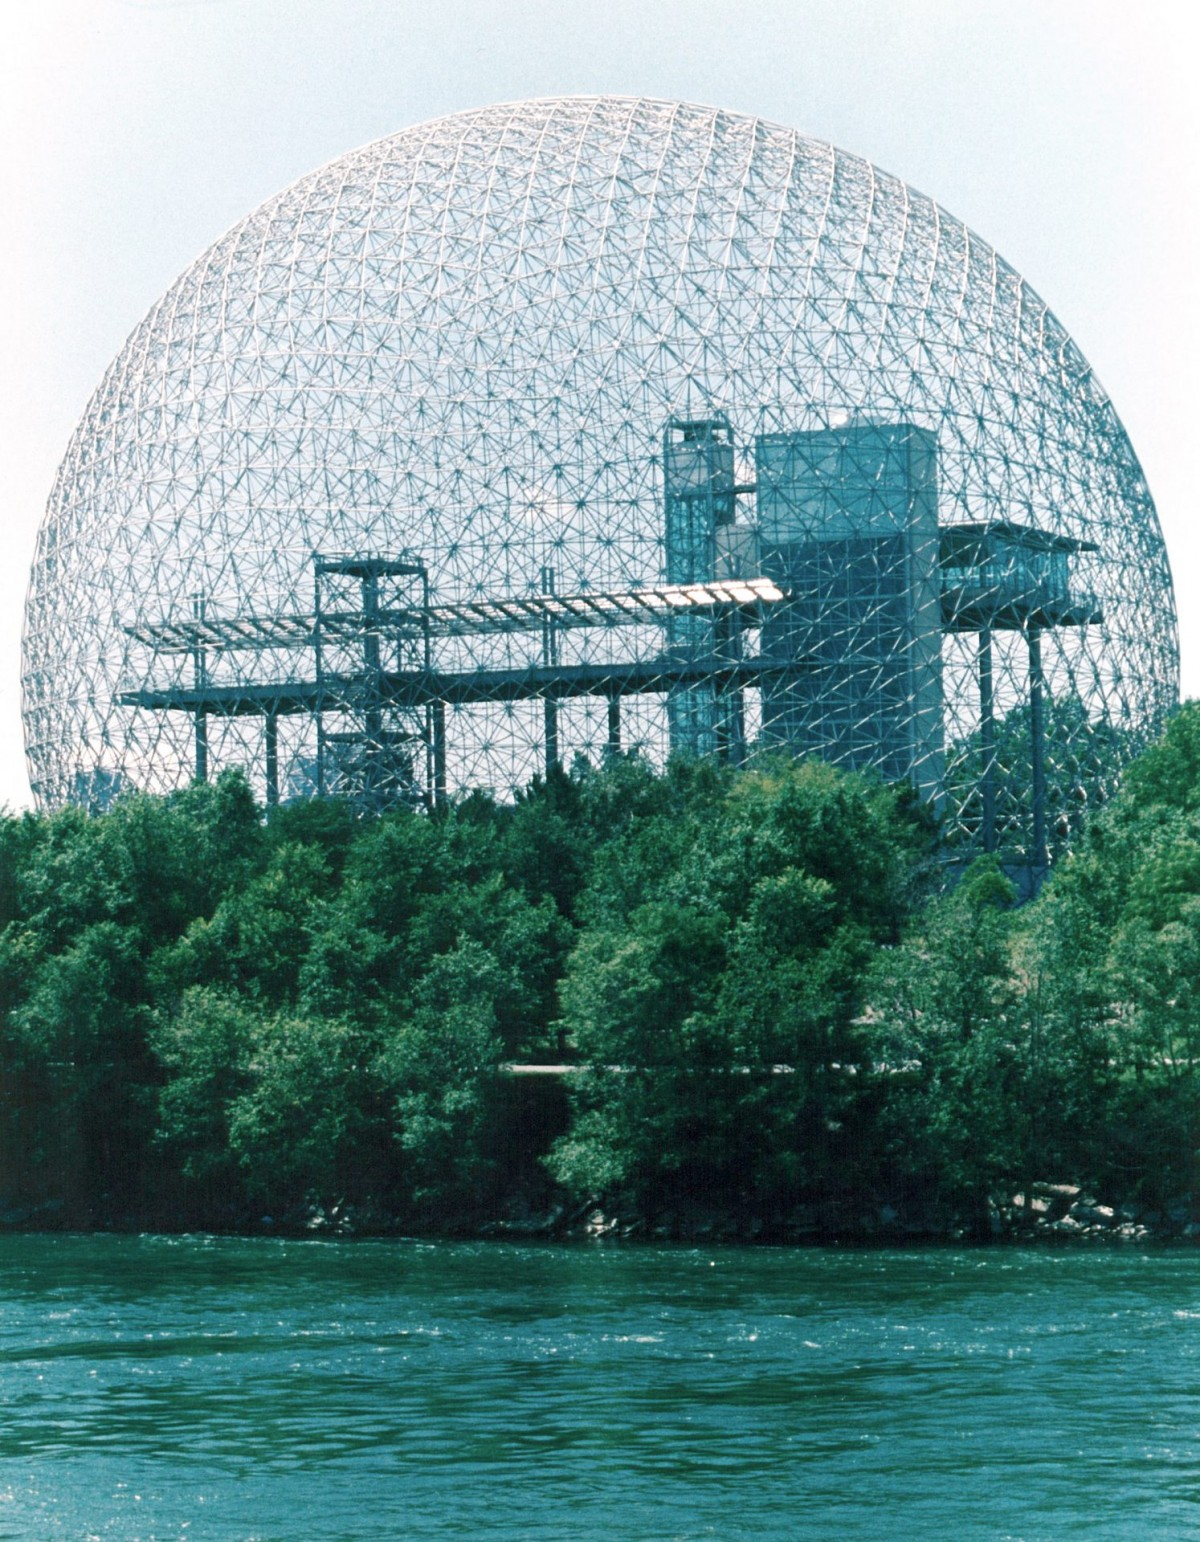 biosphere05 – RT